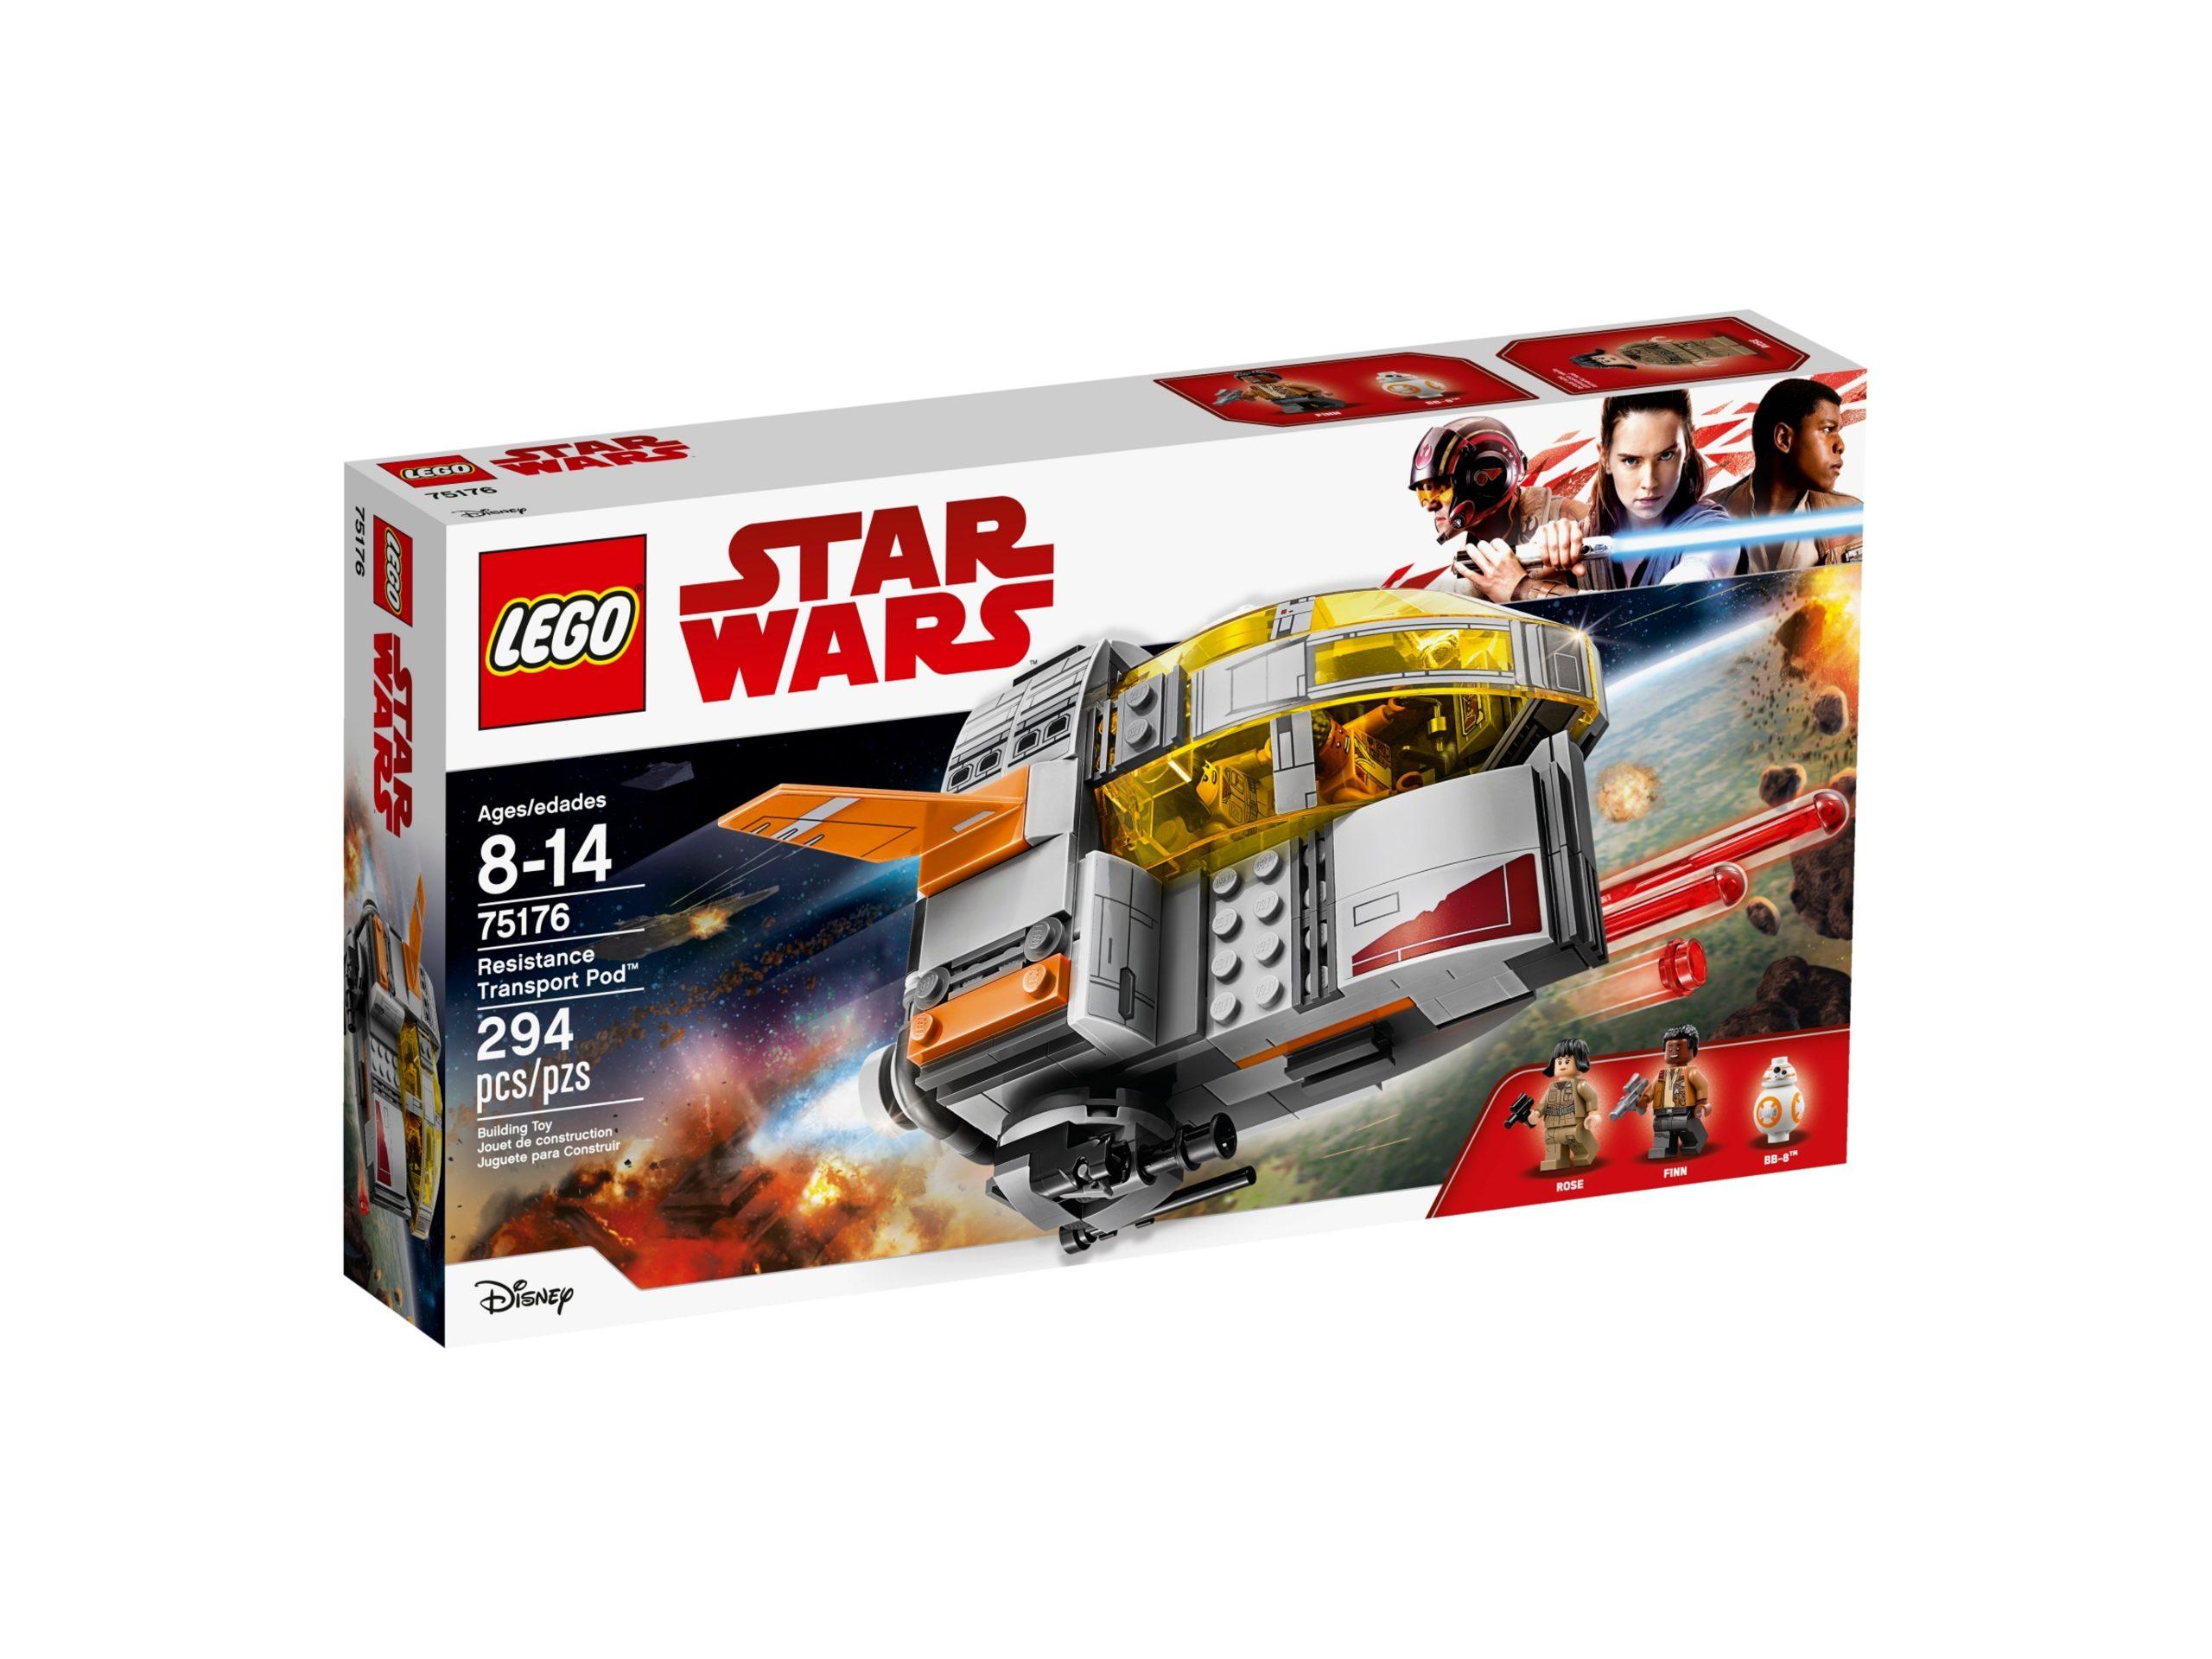 lego 75176 resistance transport pod scaled